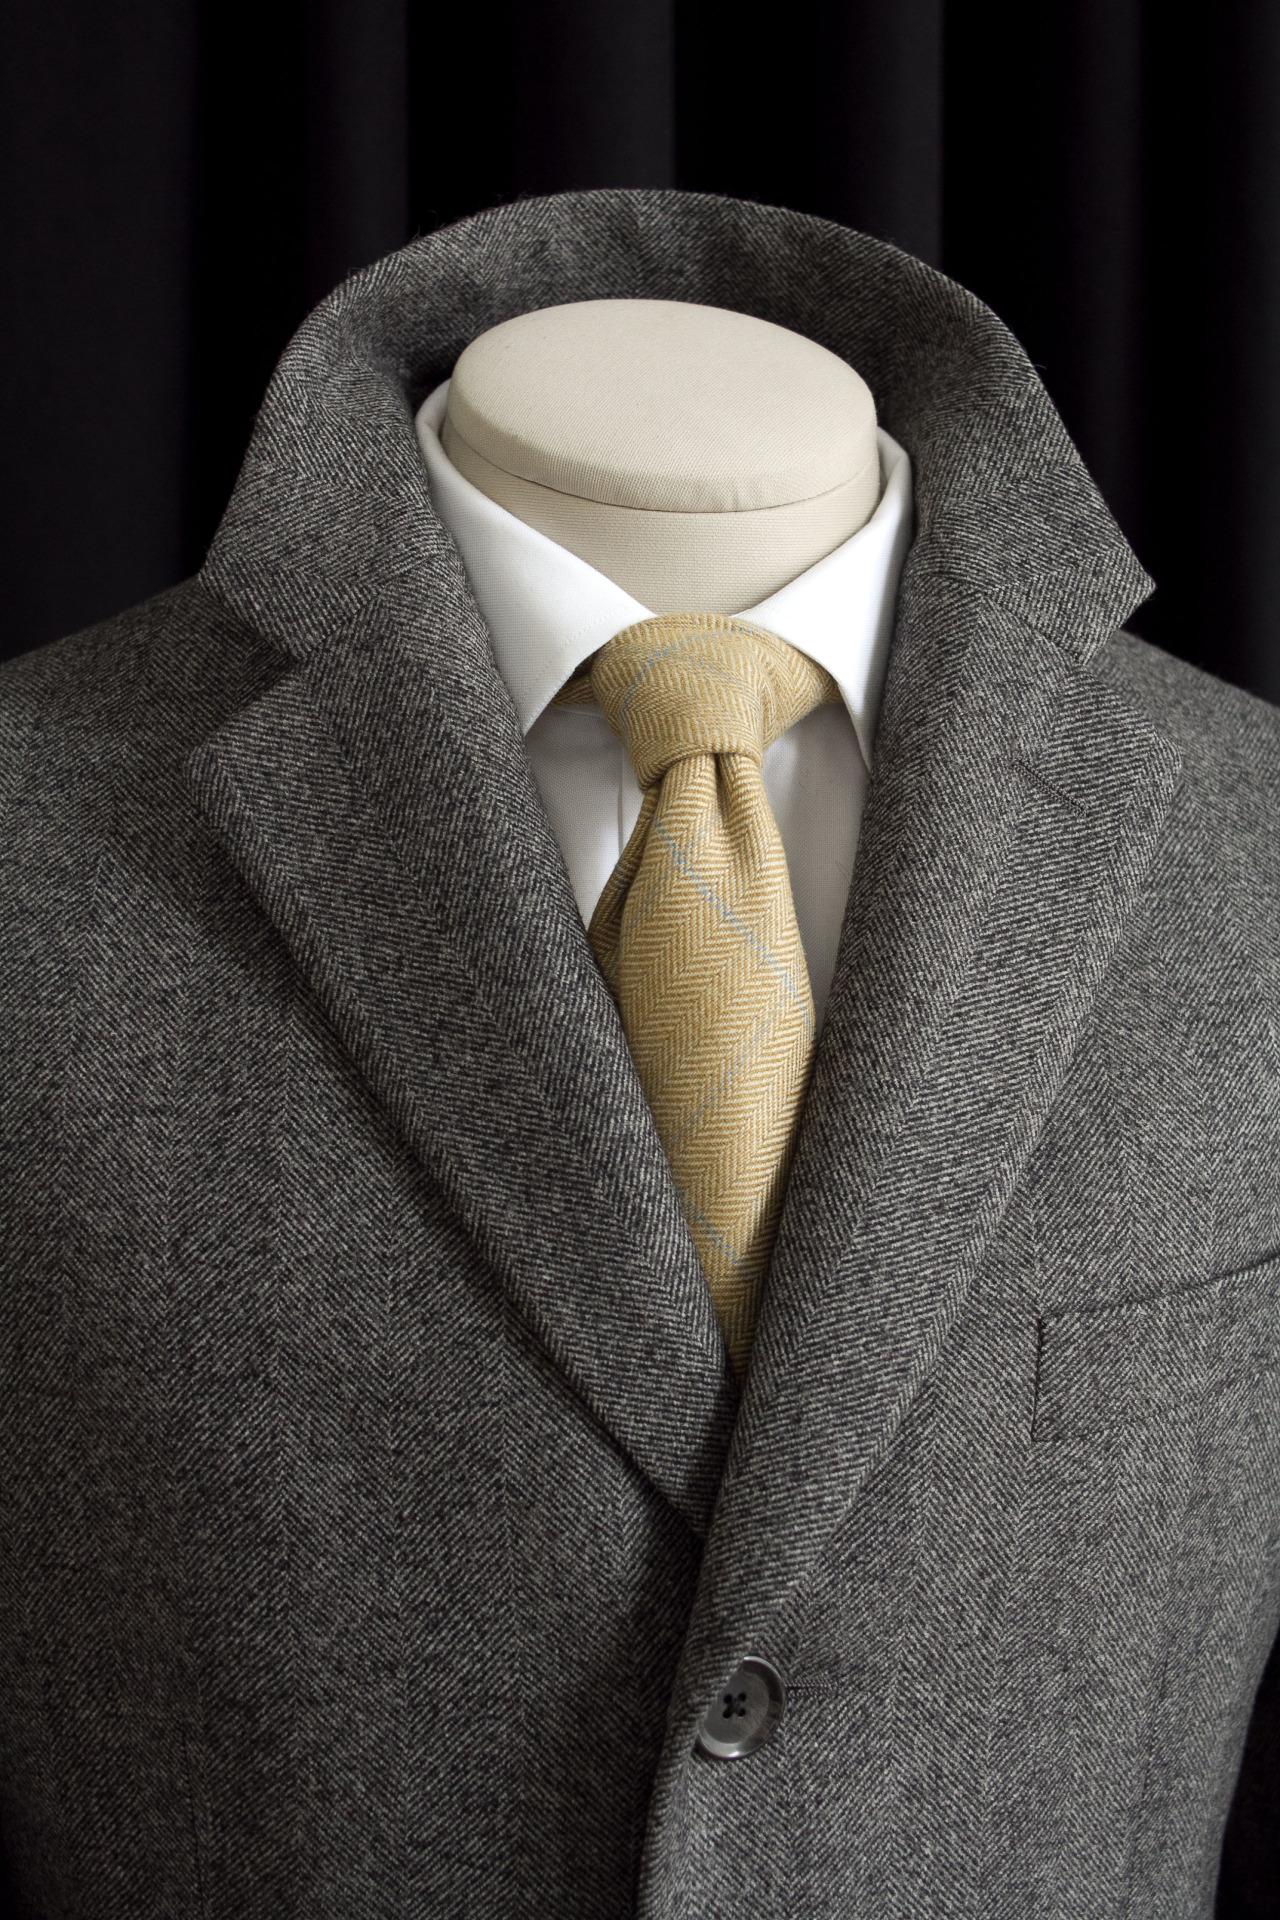 1701 Bespoke overcoat.